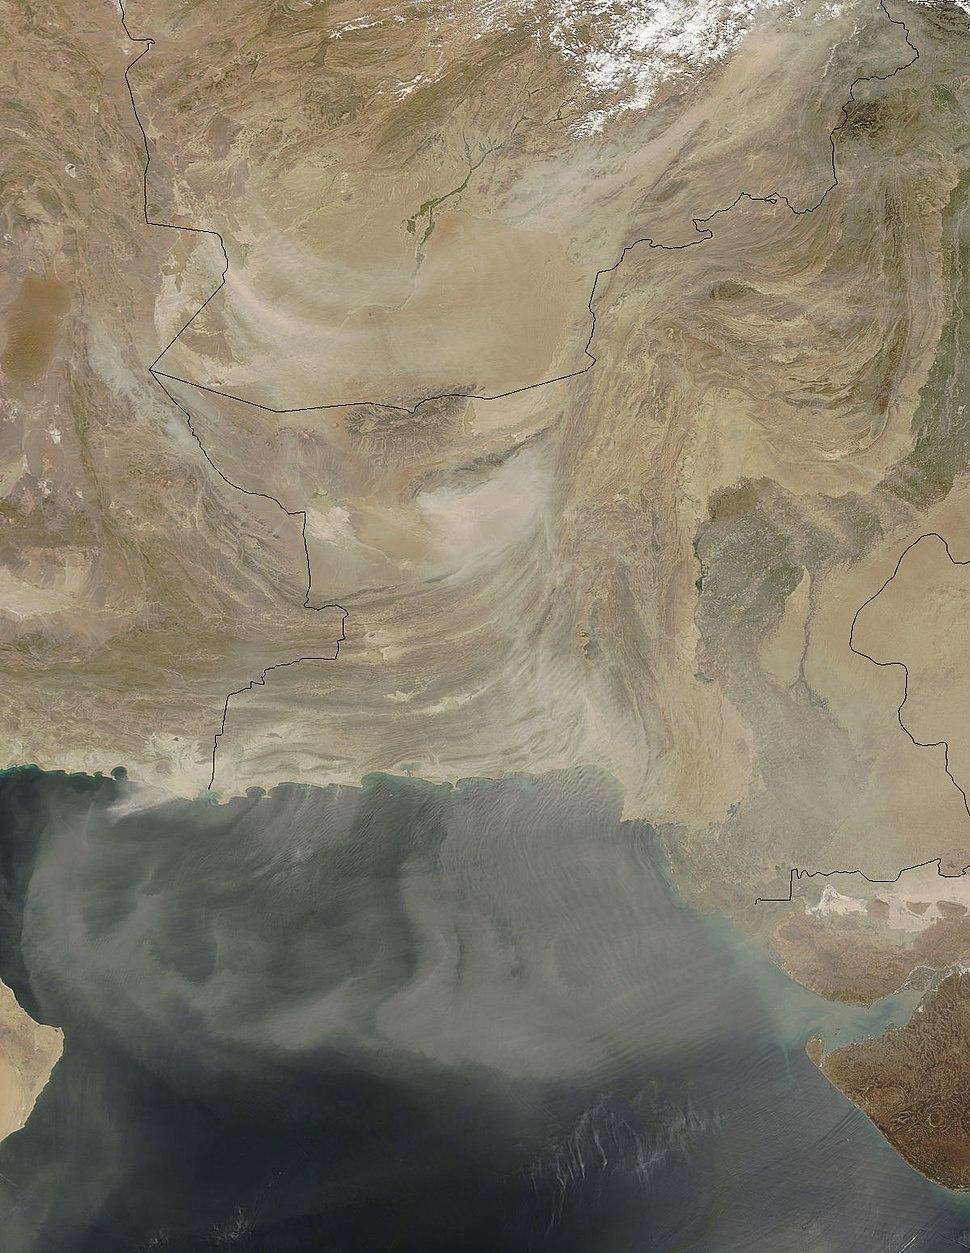 Pakistan.A2005097.0615.1km